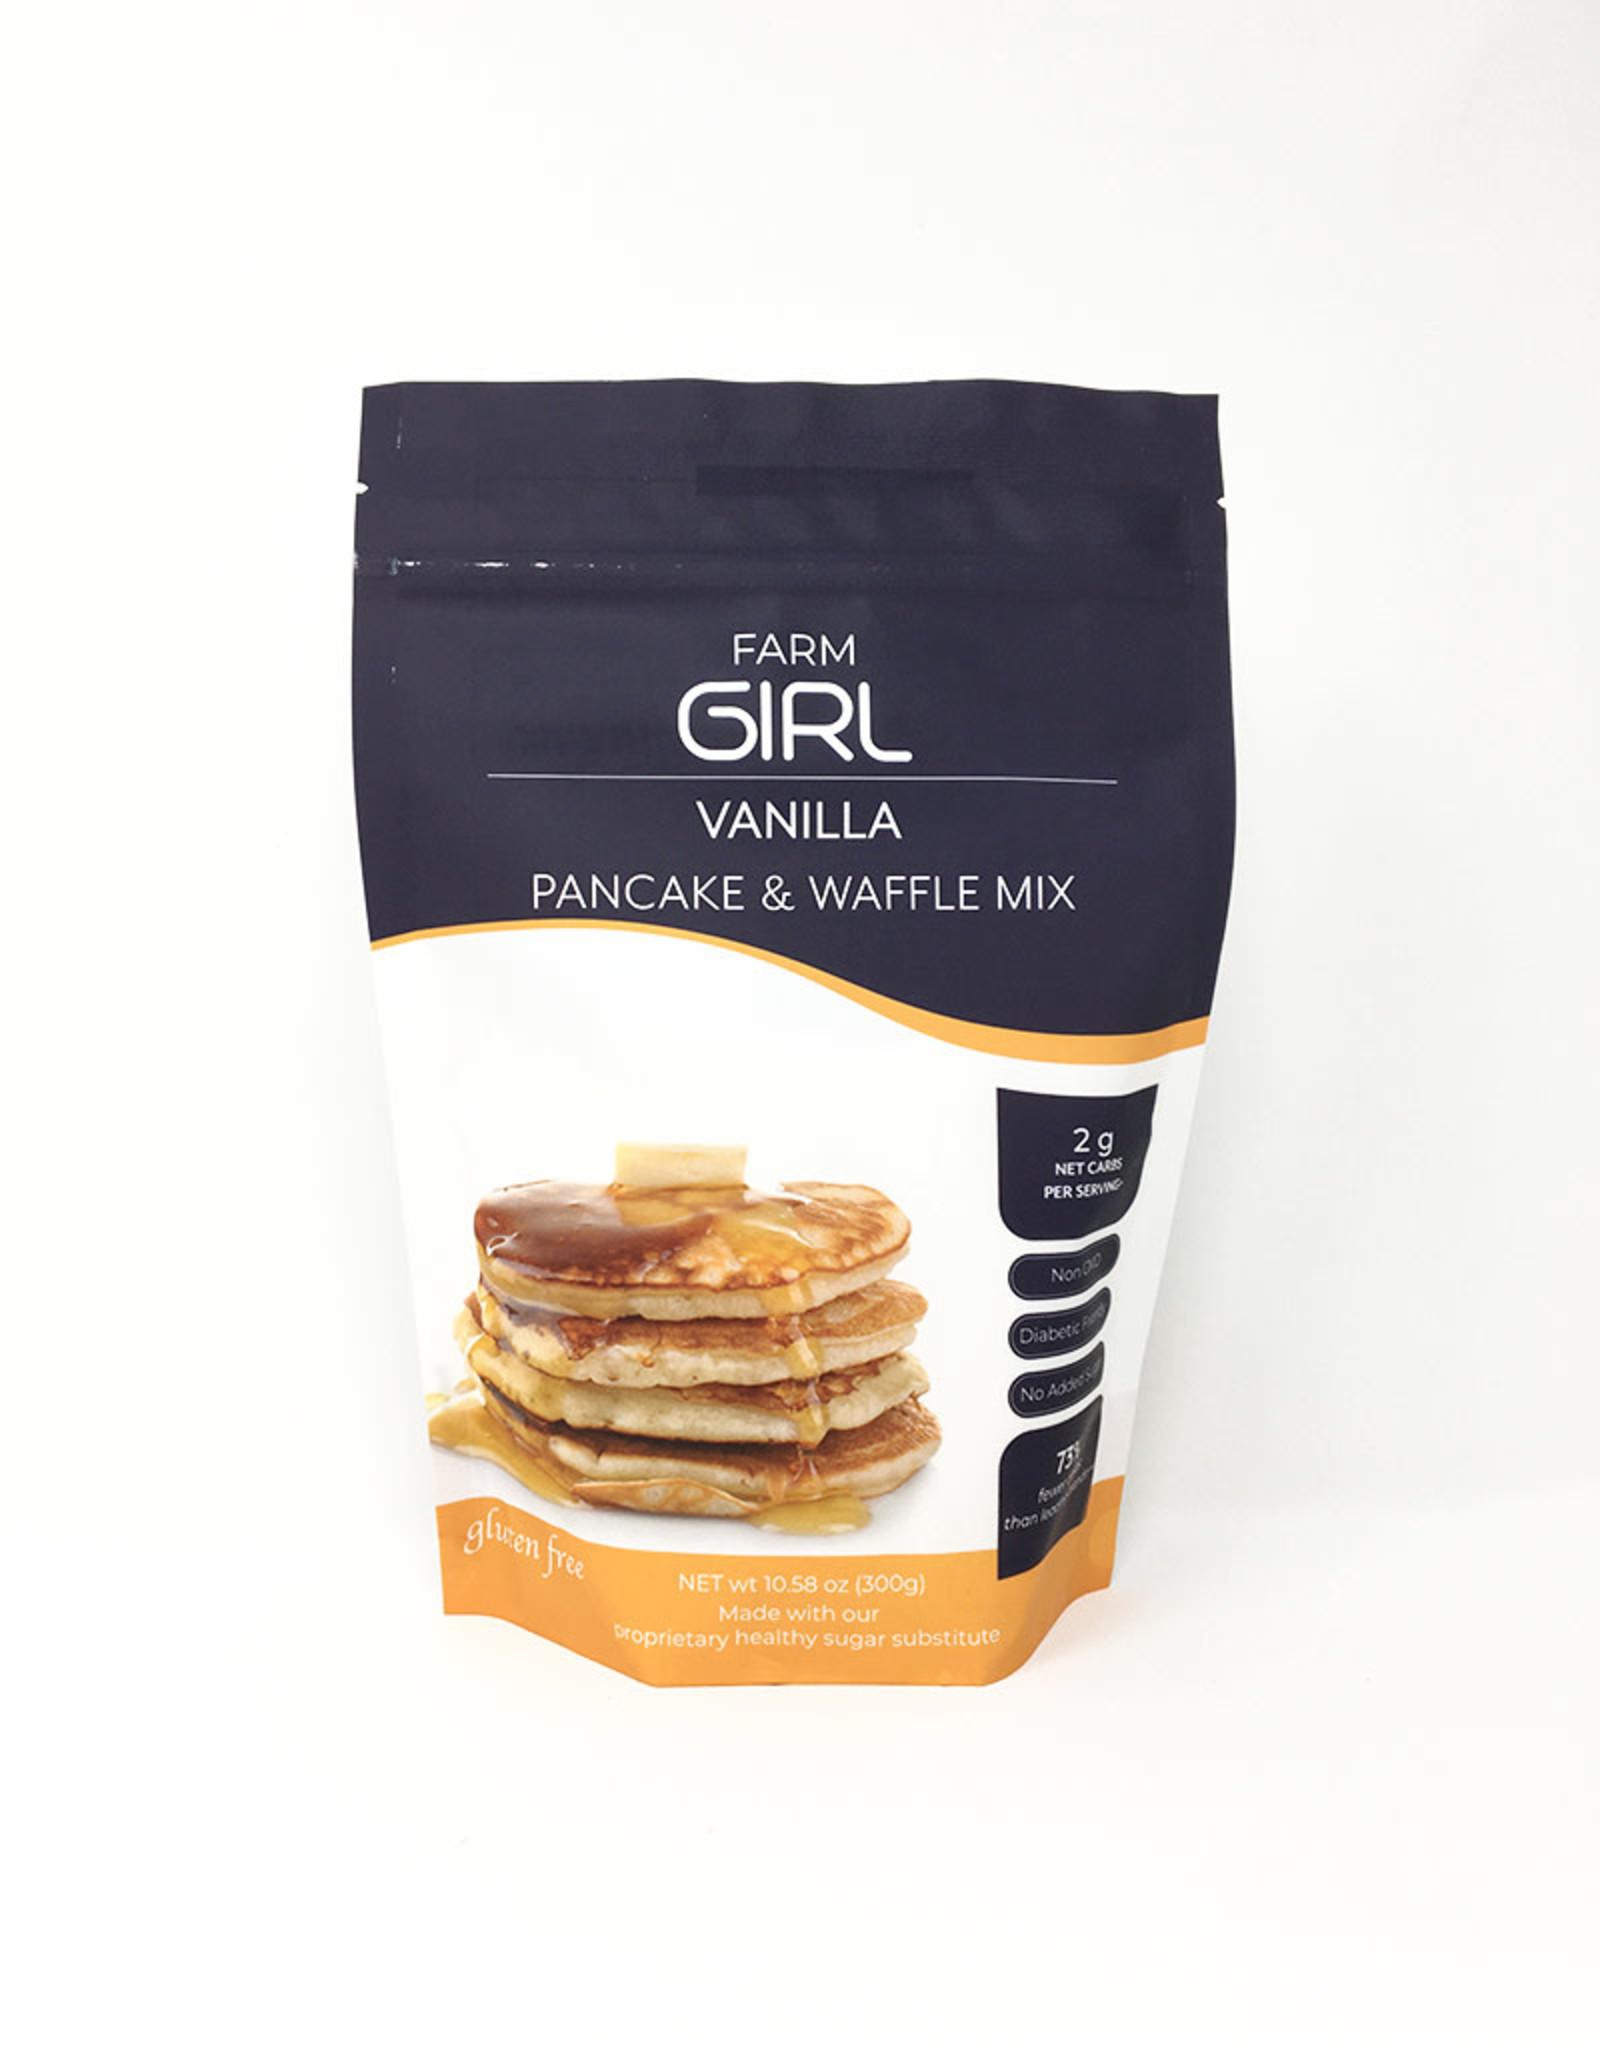 Farm Girl Farm Girl - Pancake & Waffle Mix, Vanilla (300g)